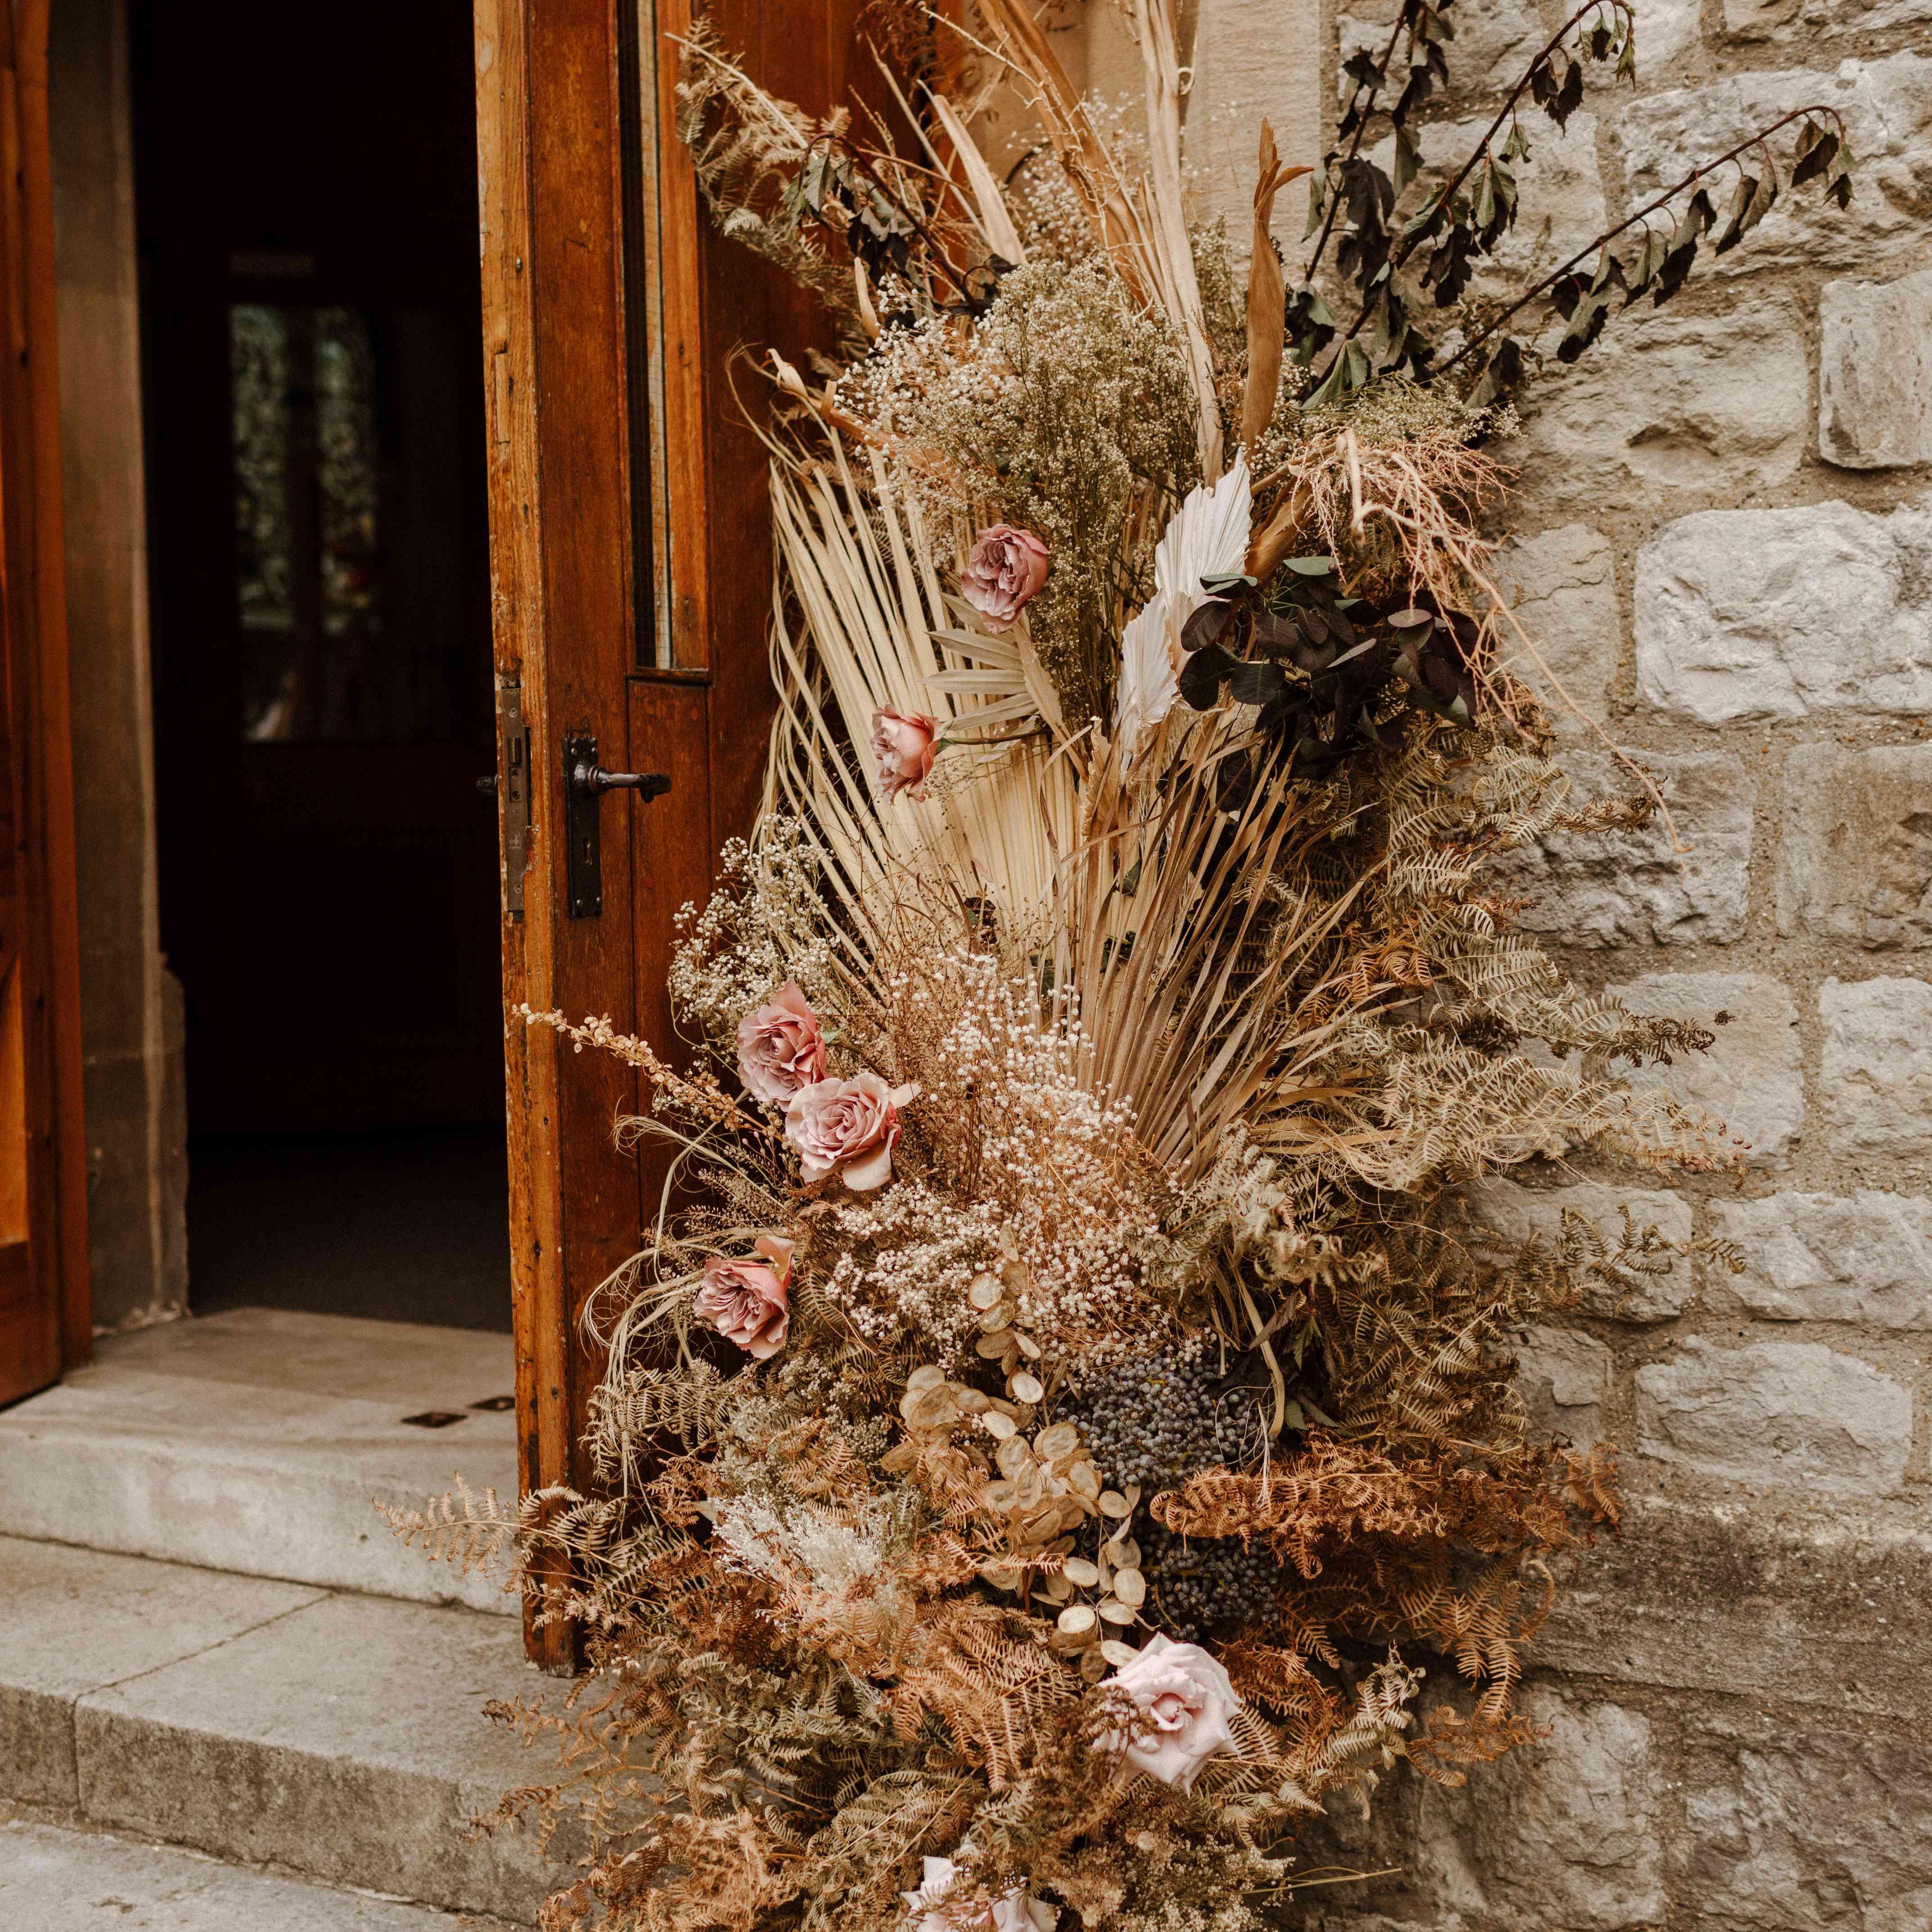 Dried florals at church door